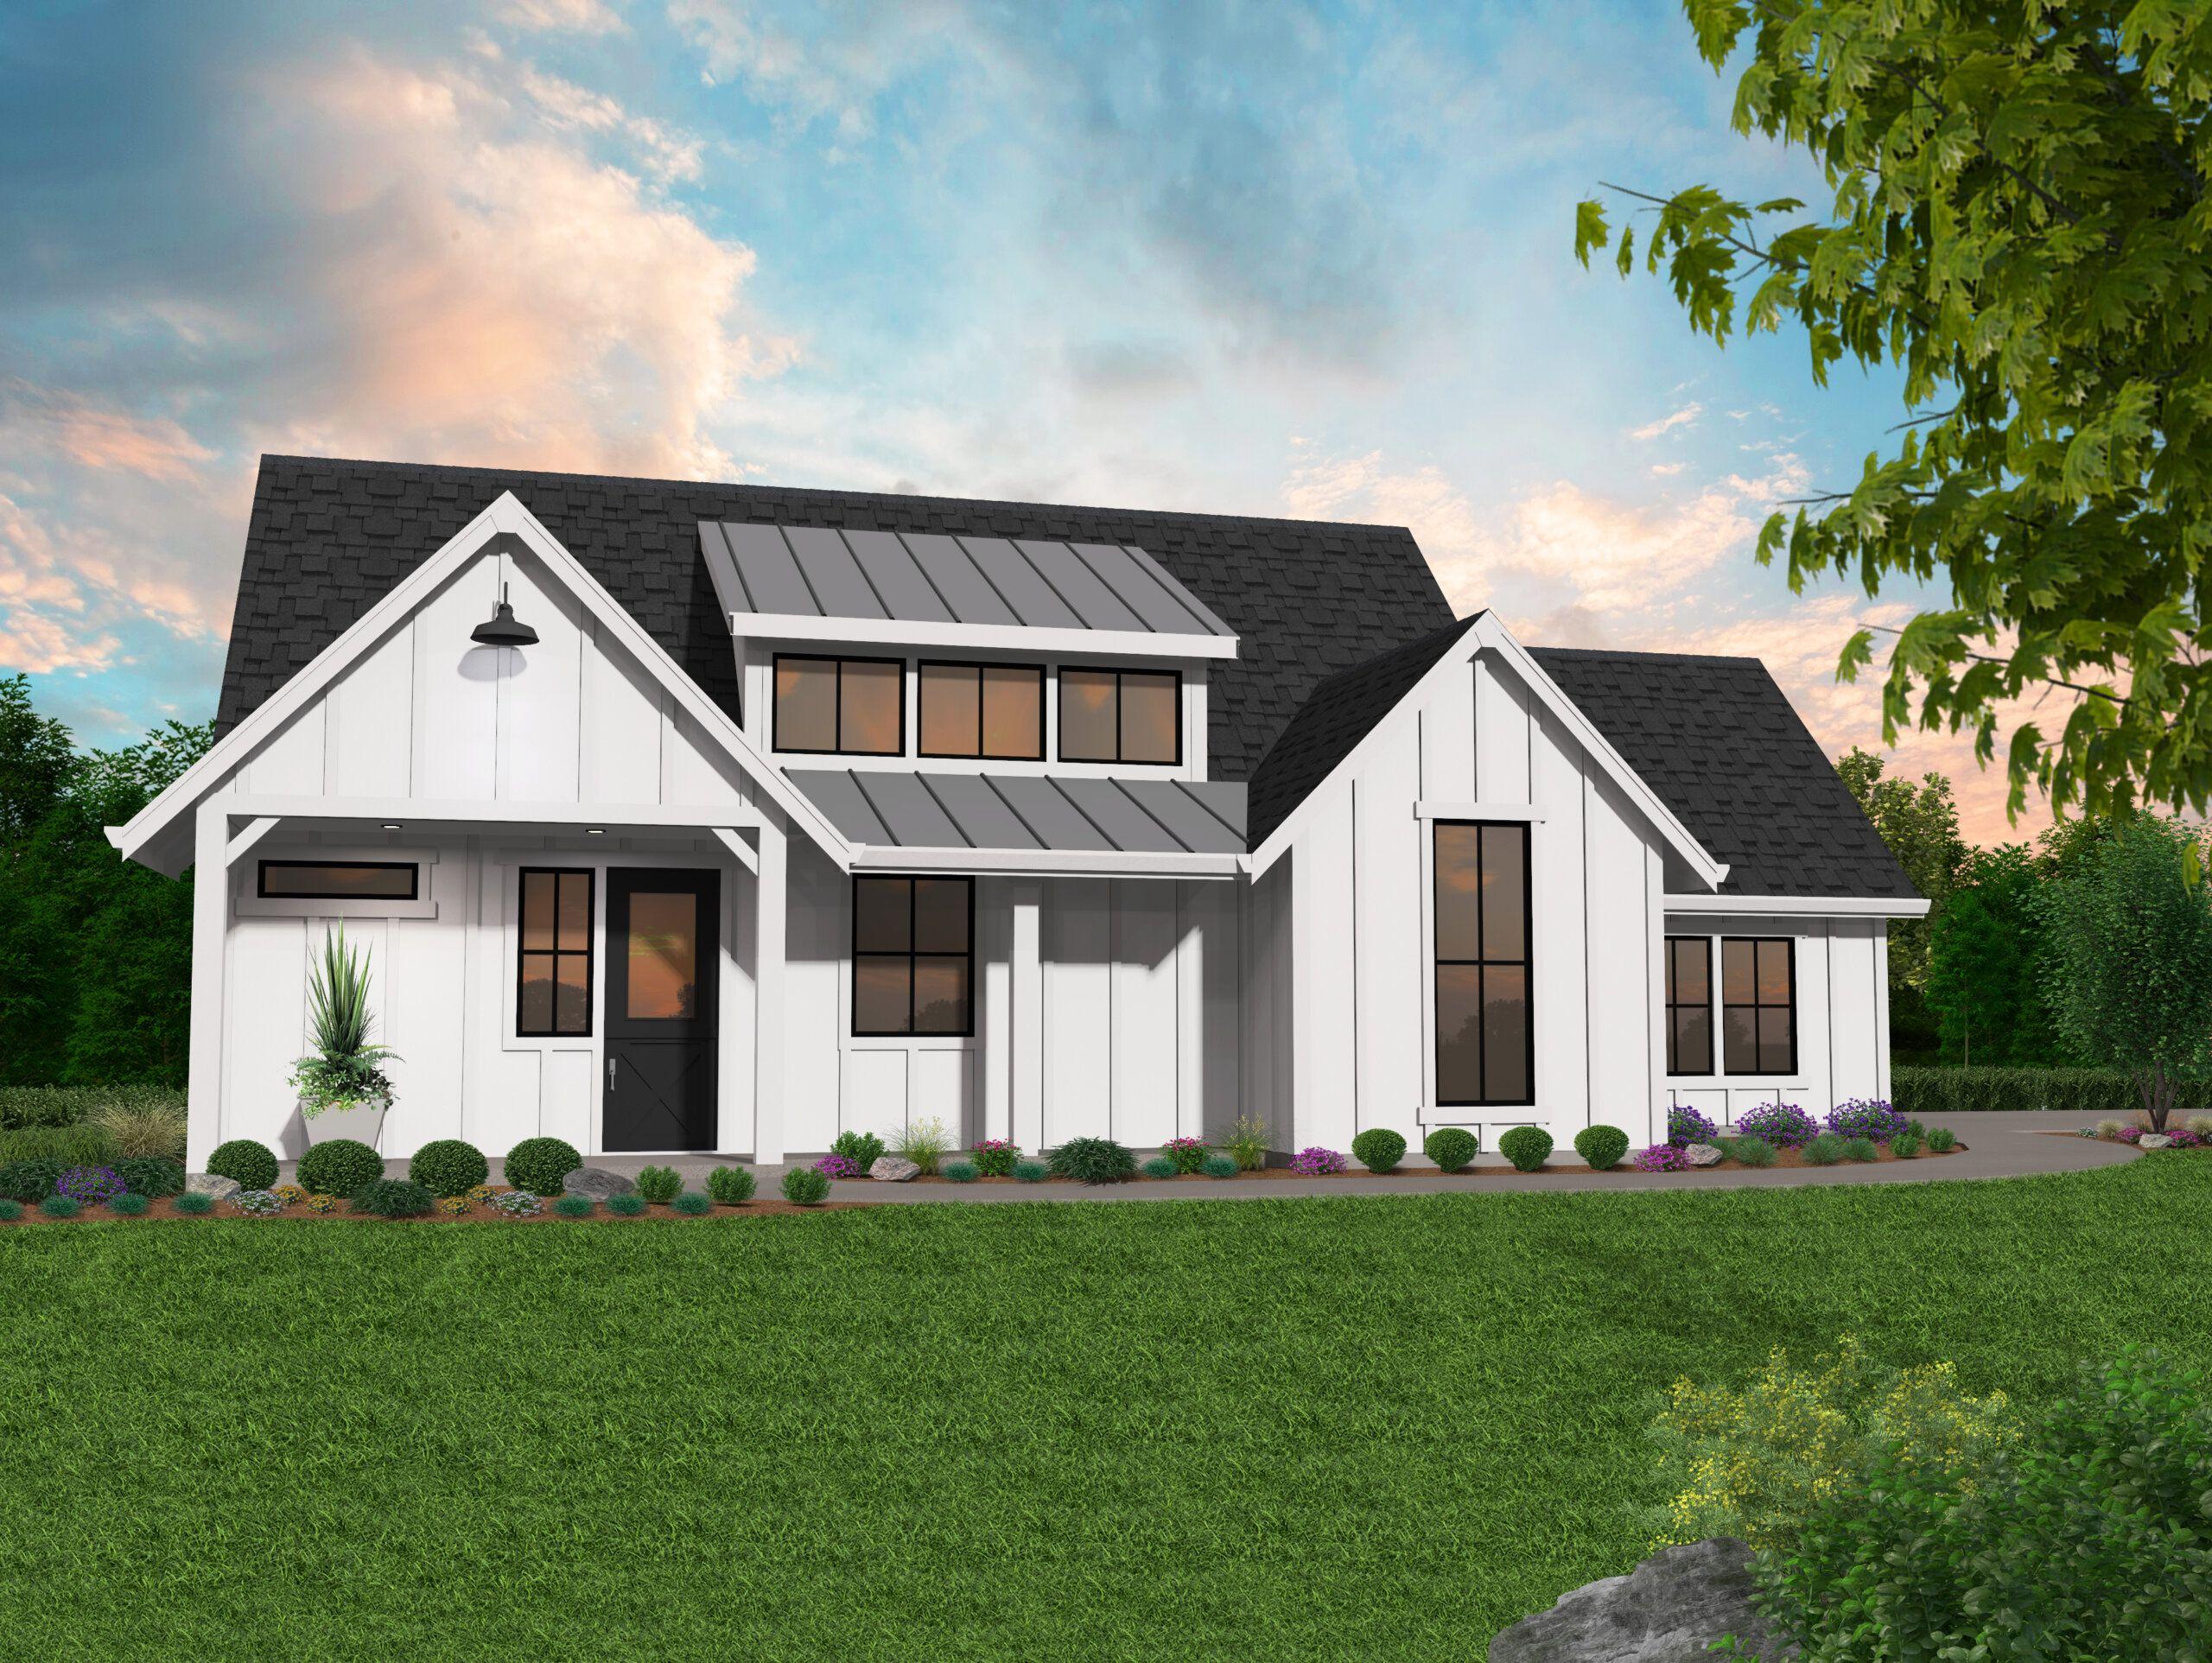 Farm 640 Heritage House Plan Modern Farmhouse Home Design In 2020 Heritage House House Plans With Pictures Cottage House Plans